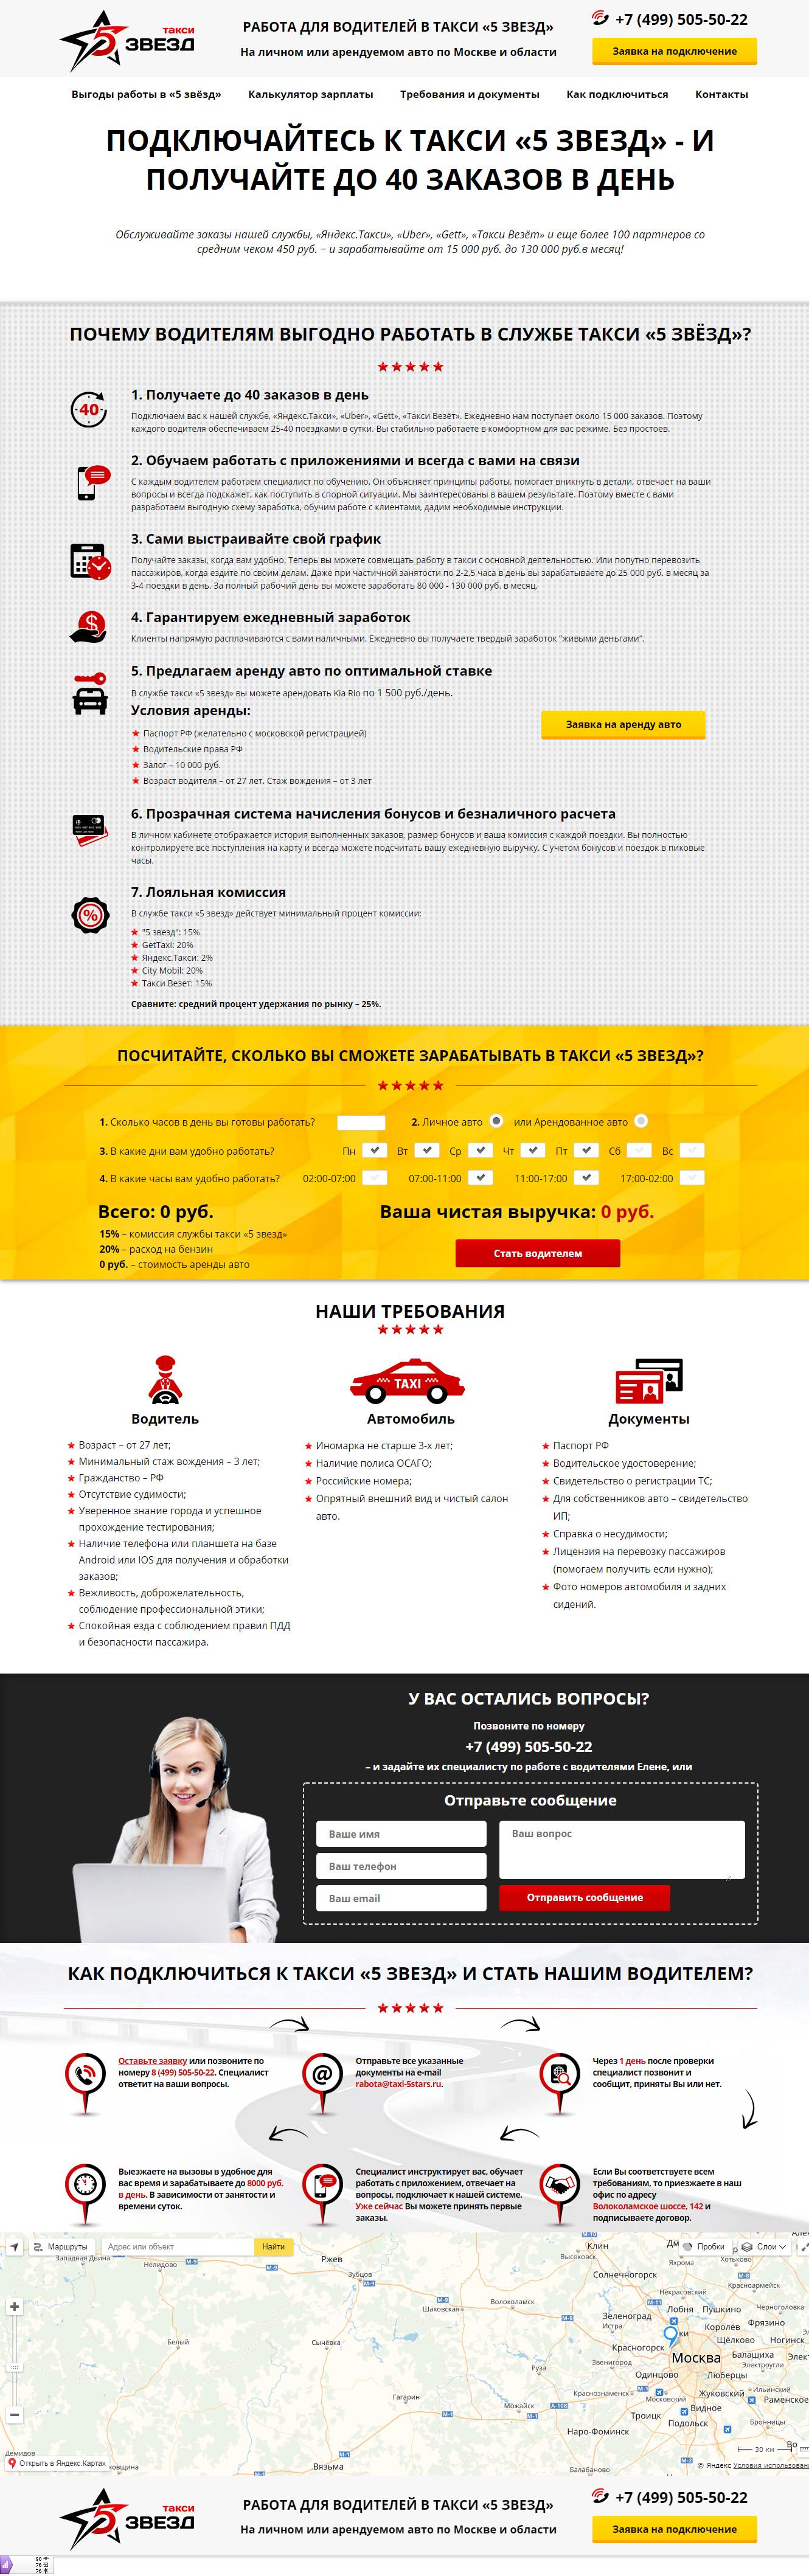 Подключение к службам такси